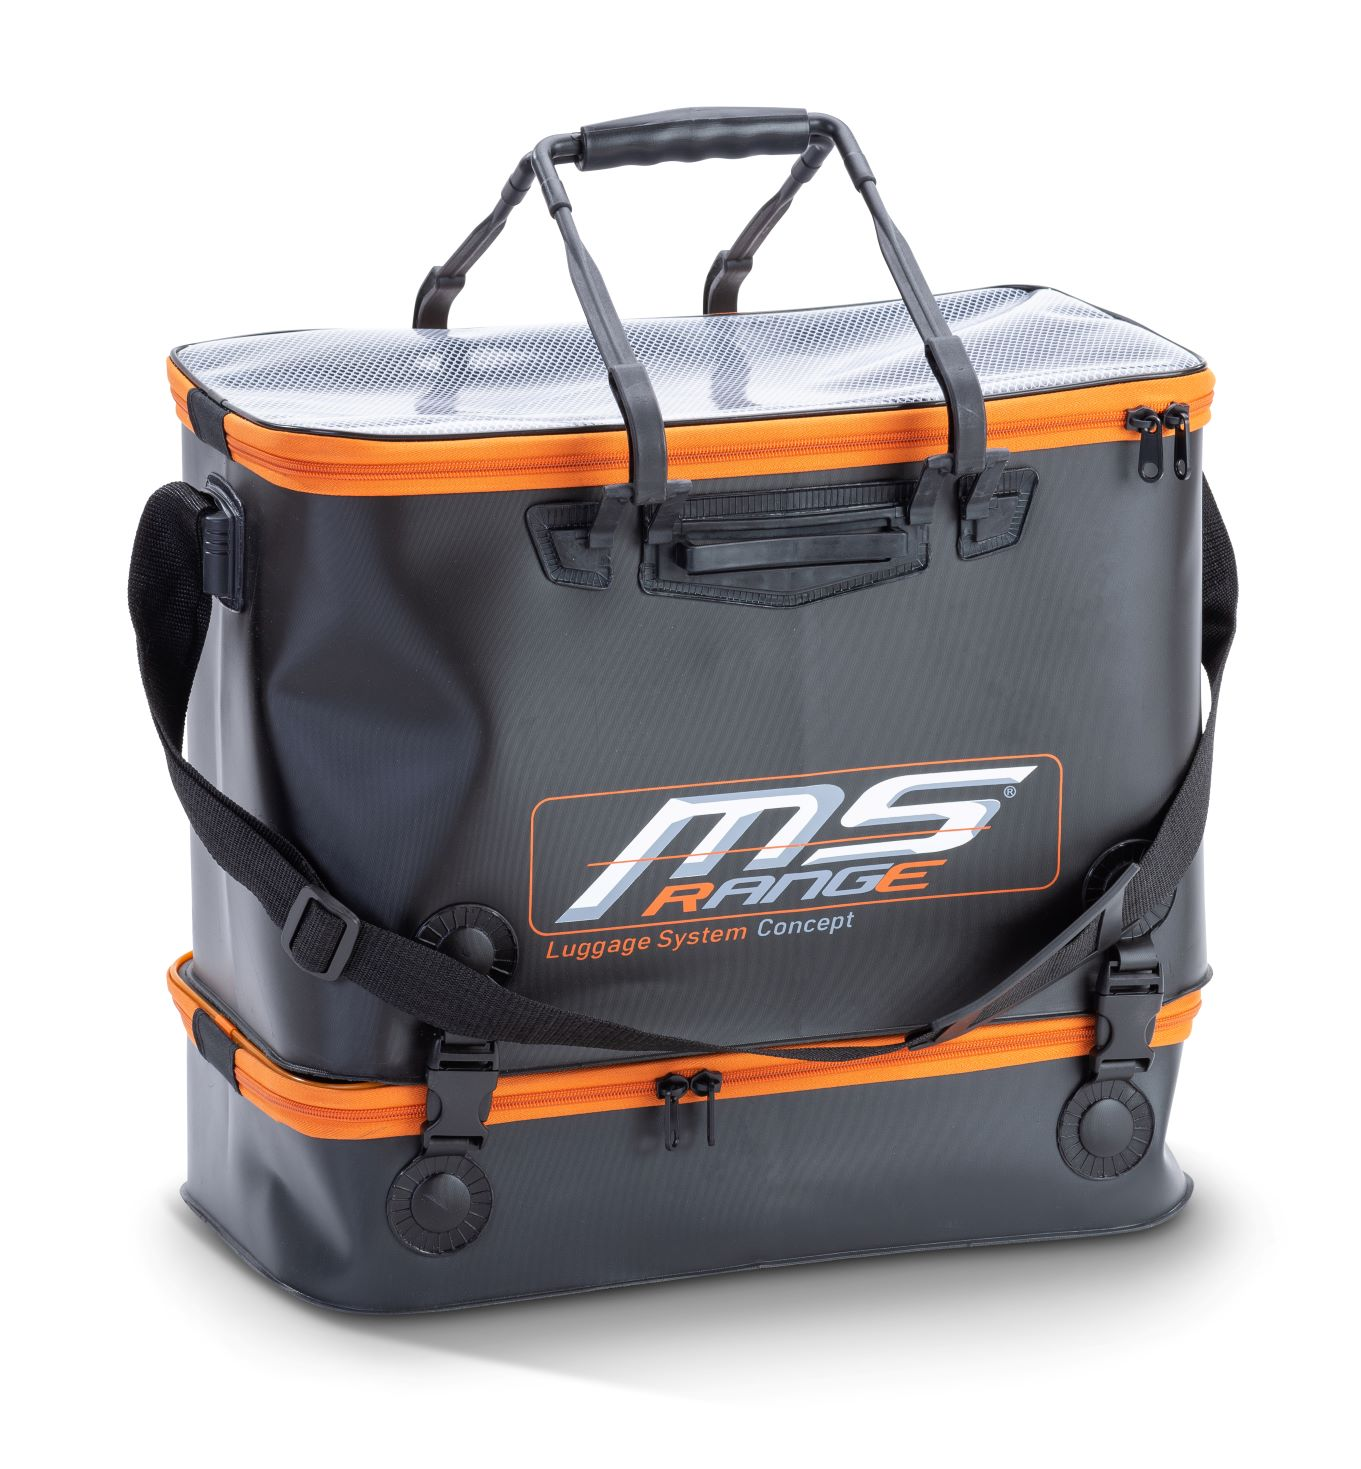 MS Range taška WP Double, vel. L